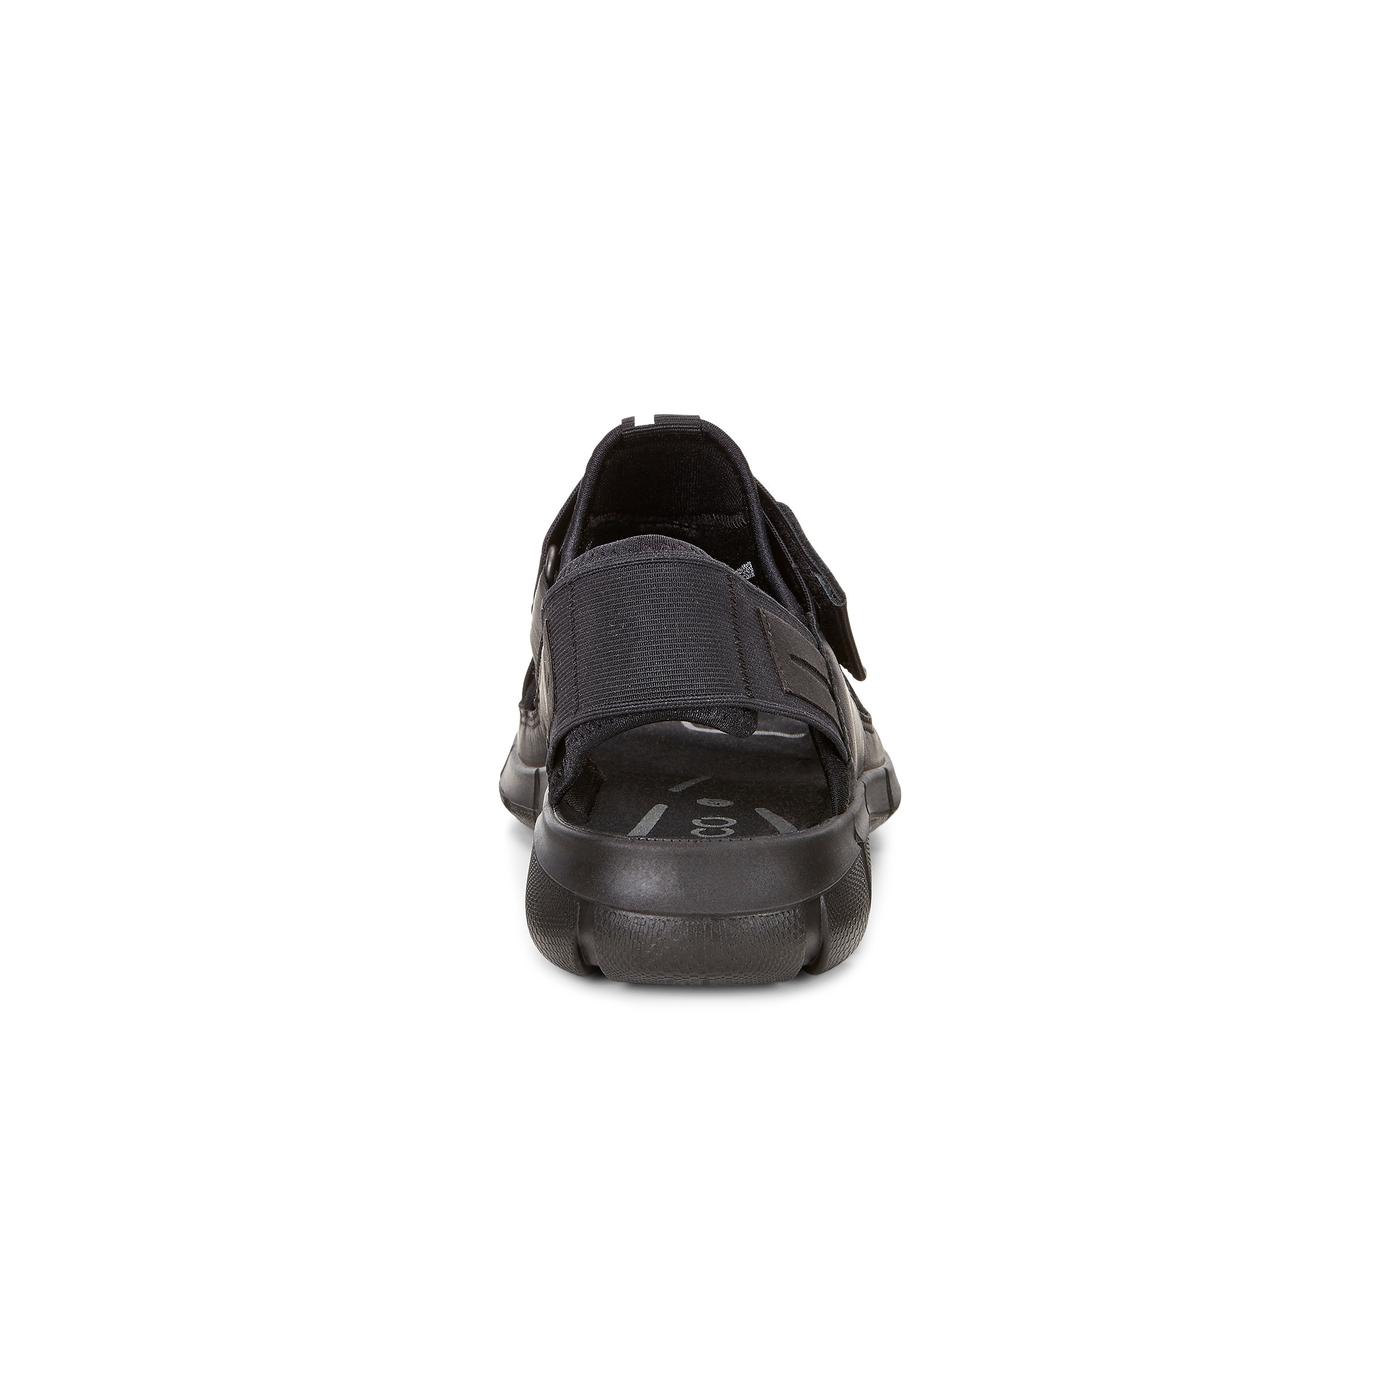 ECCO INTRINSIC Mens Sandal